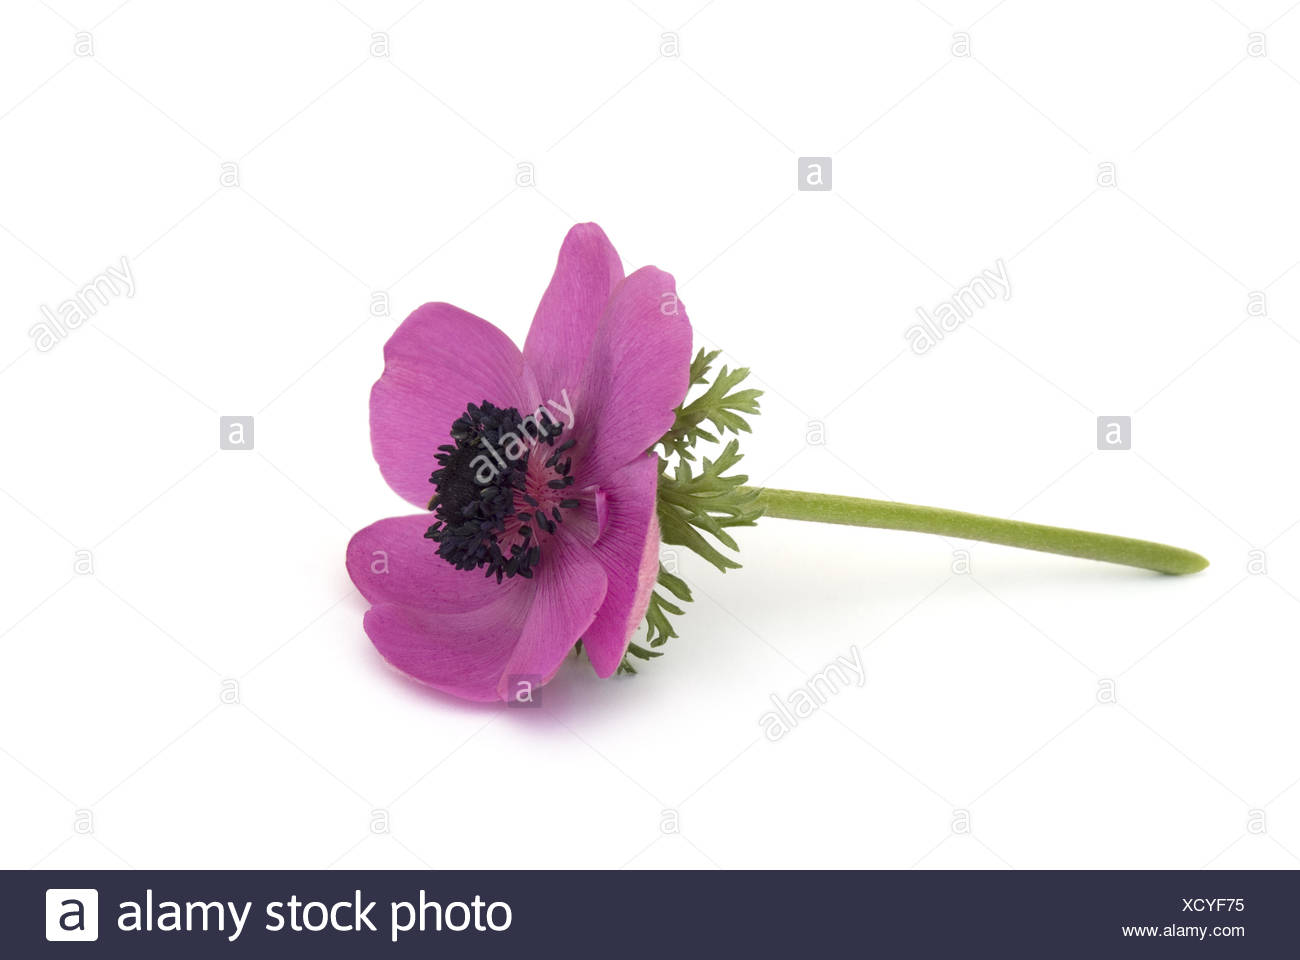 Anemone flower - Stock Image